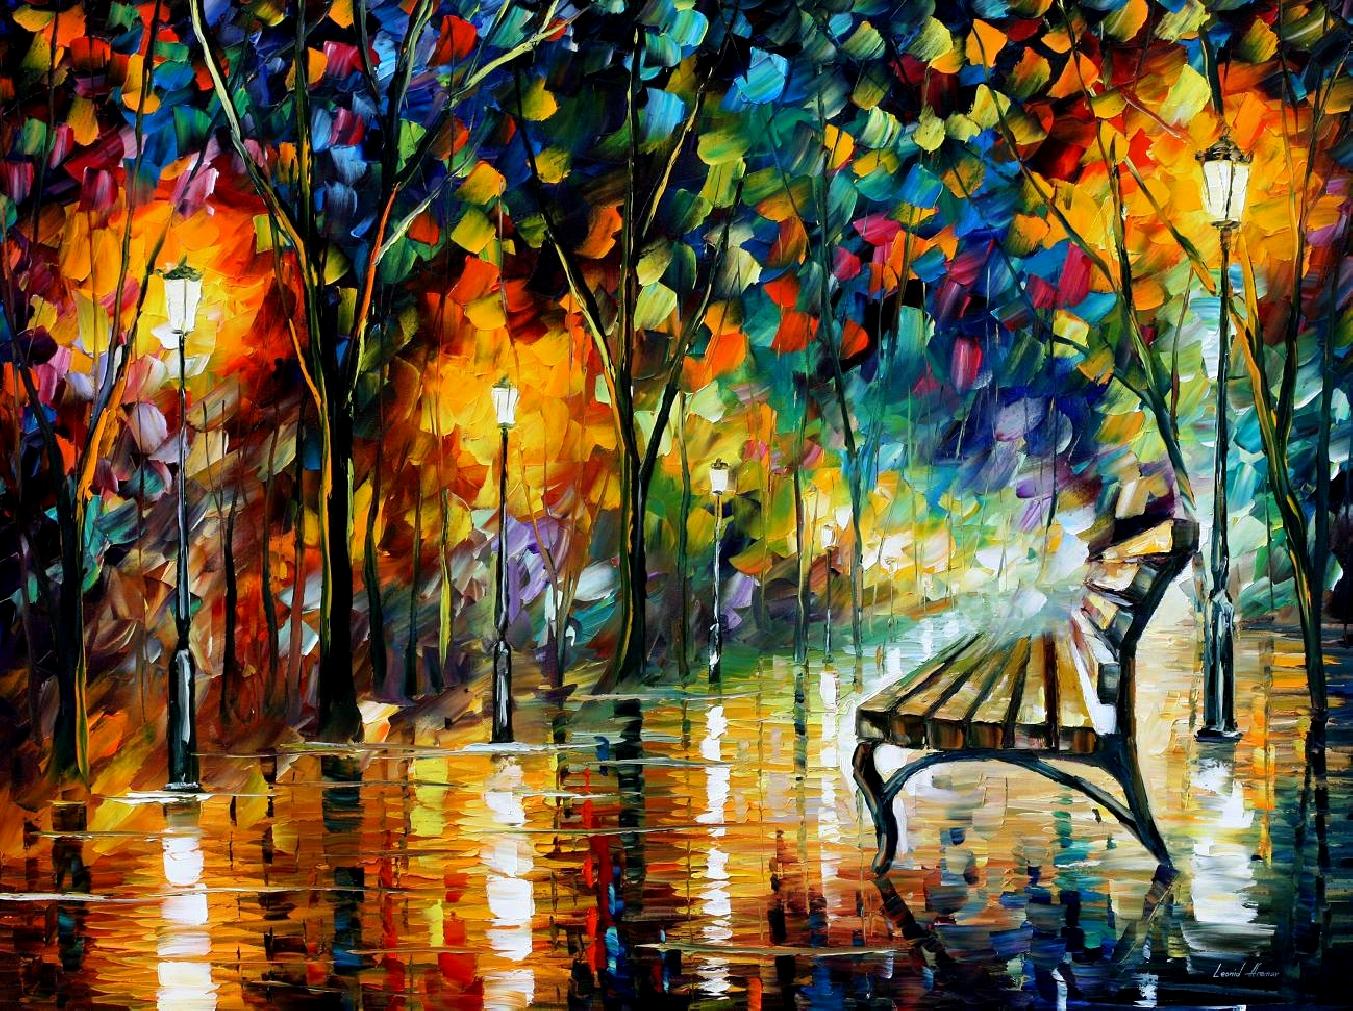 Leonid Afremov - Night Loneliness